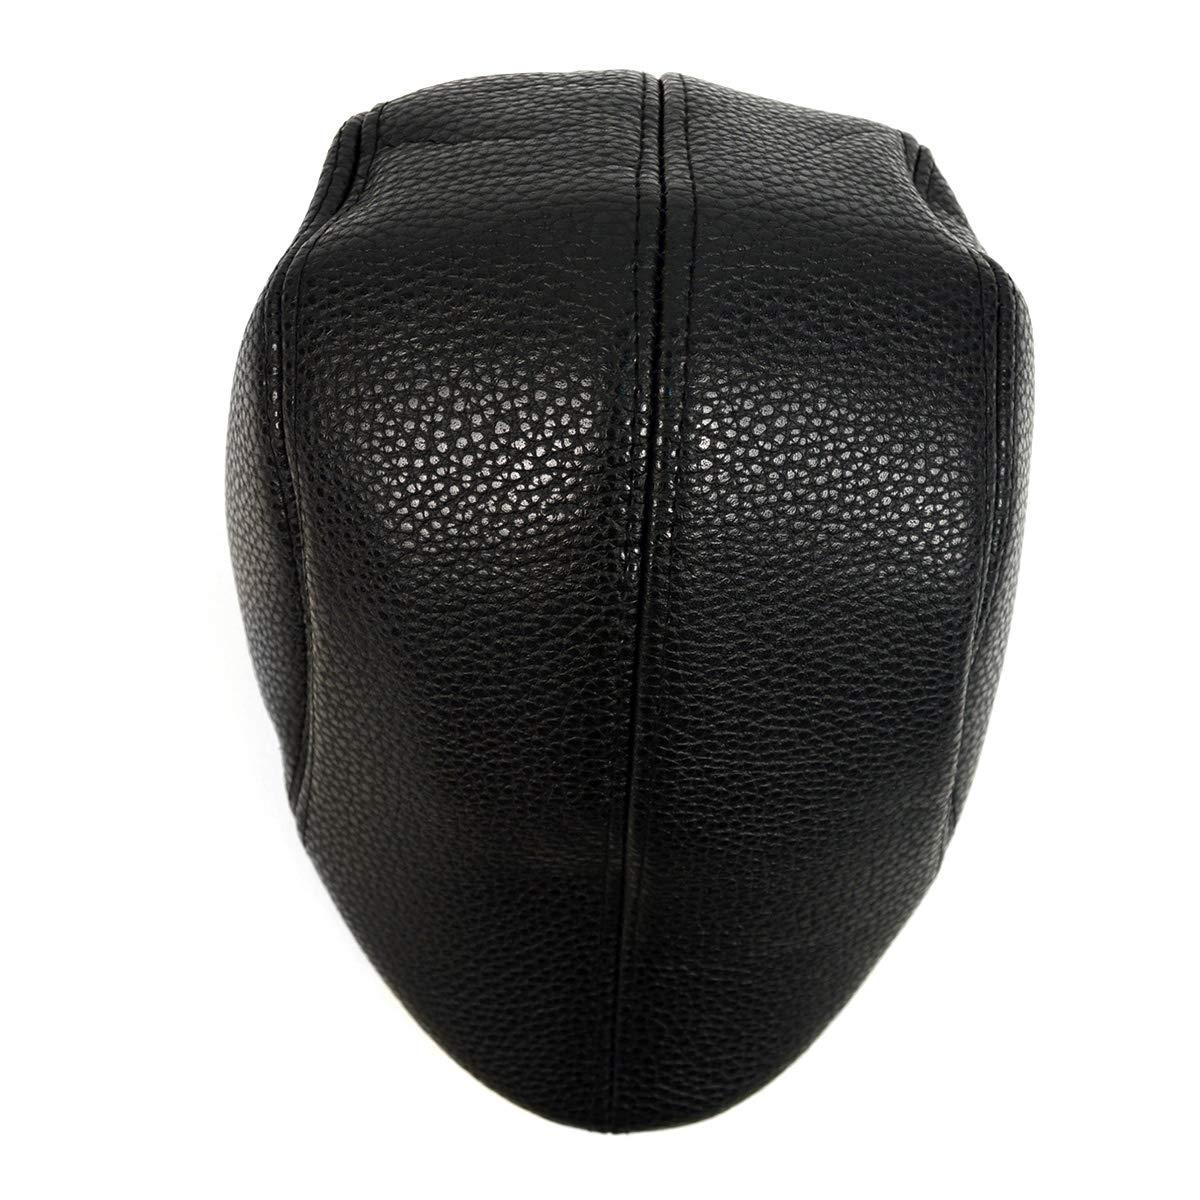 BG Black Leather Ivy Hat for Men Fall//Winter